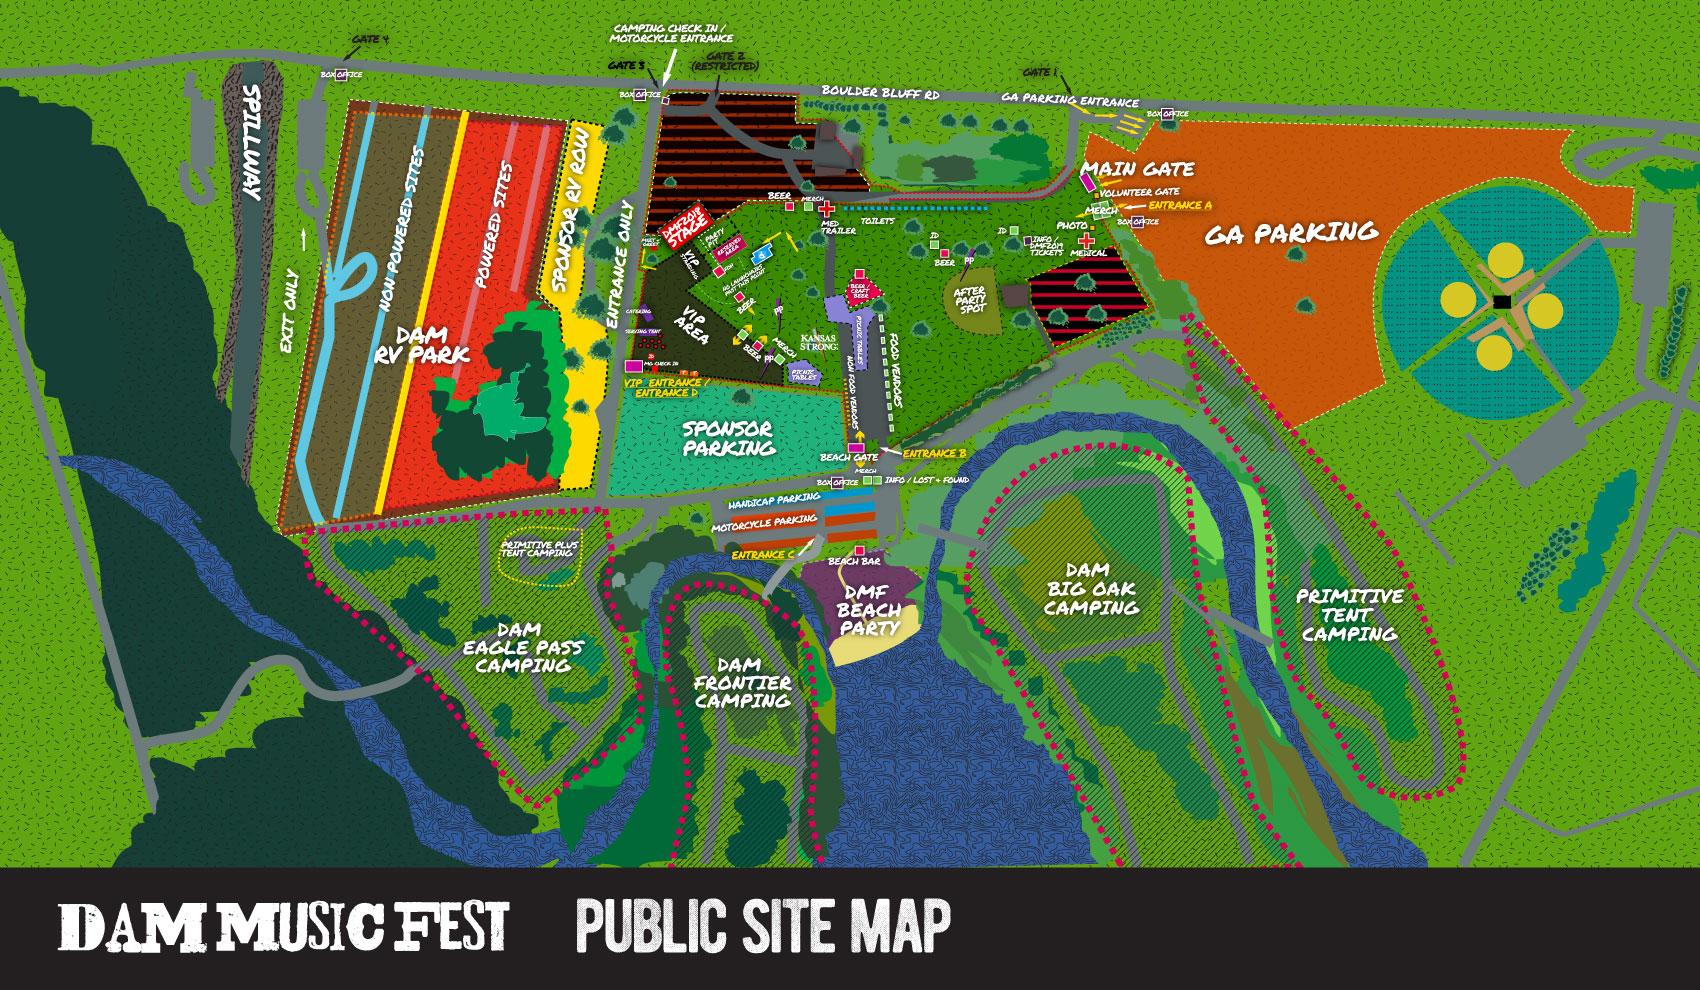 DMF-PUBLIC-SITE-MAP-061019-01.jpg